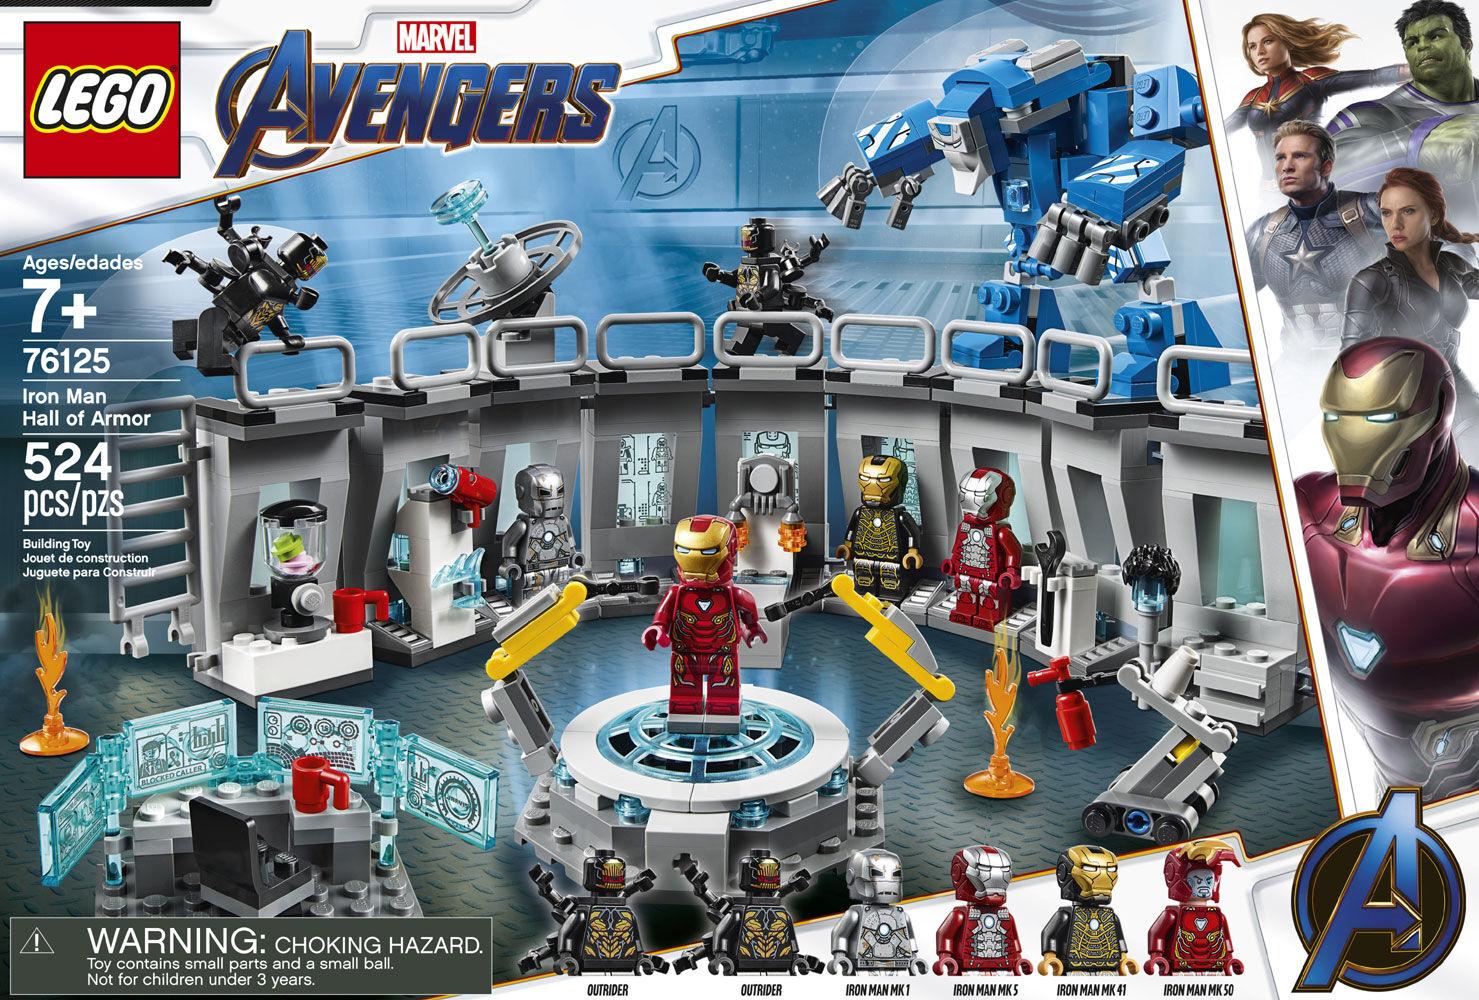 LEGO 76125 Marvel Avengers End Game Iron Man Hall of Armor 524 pcs NEW SEALED